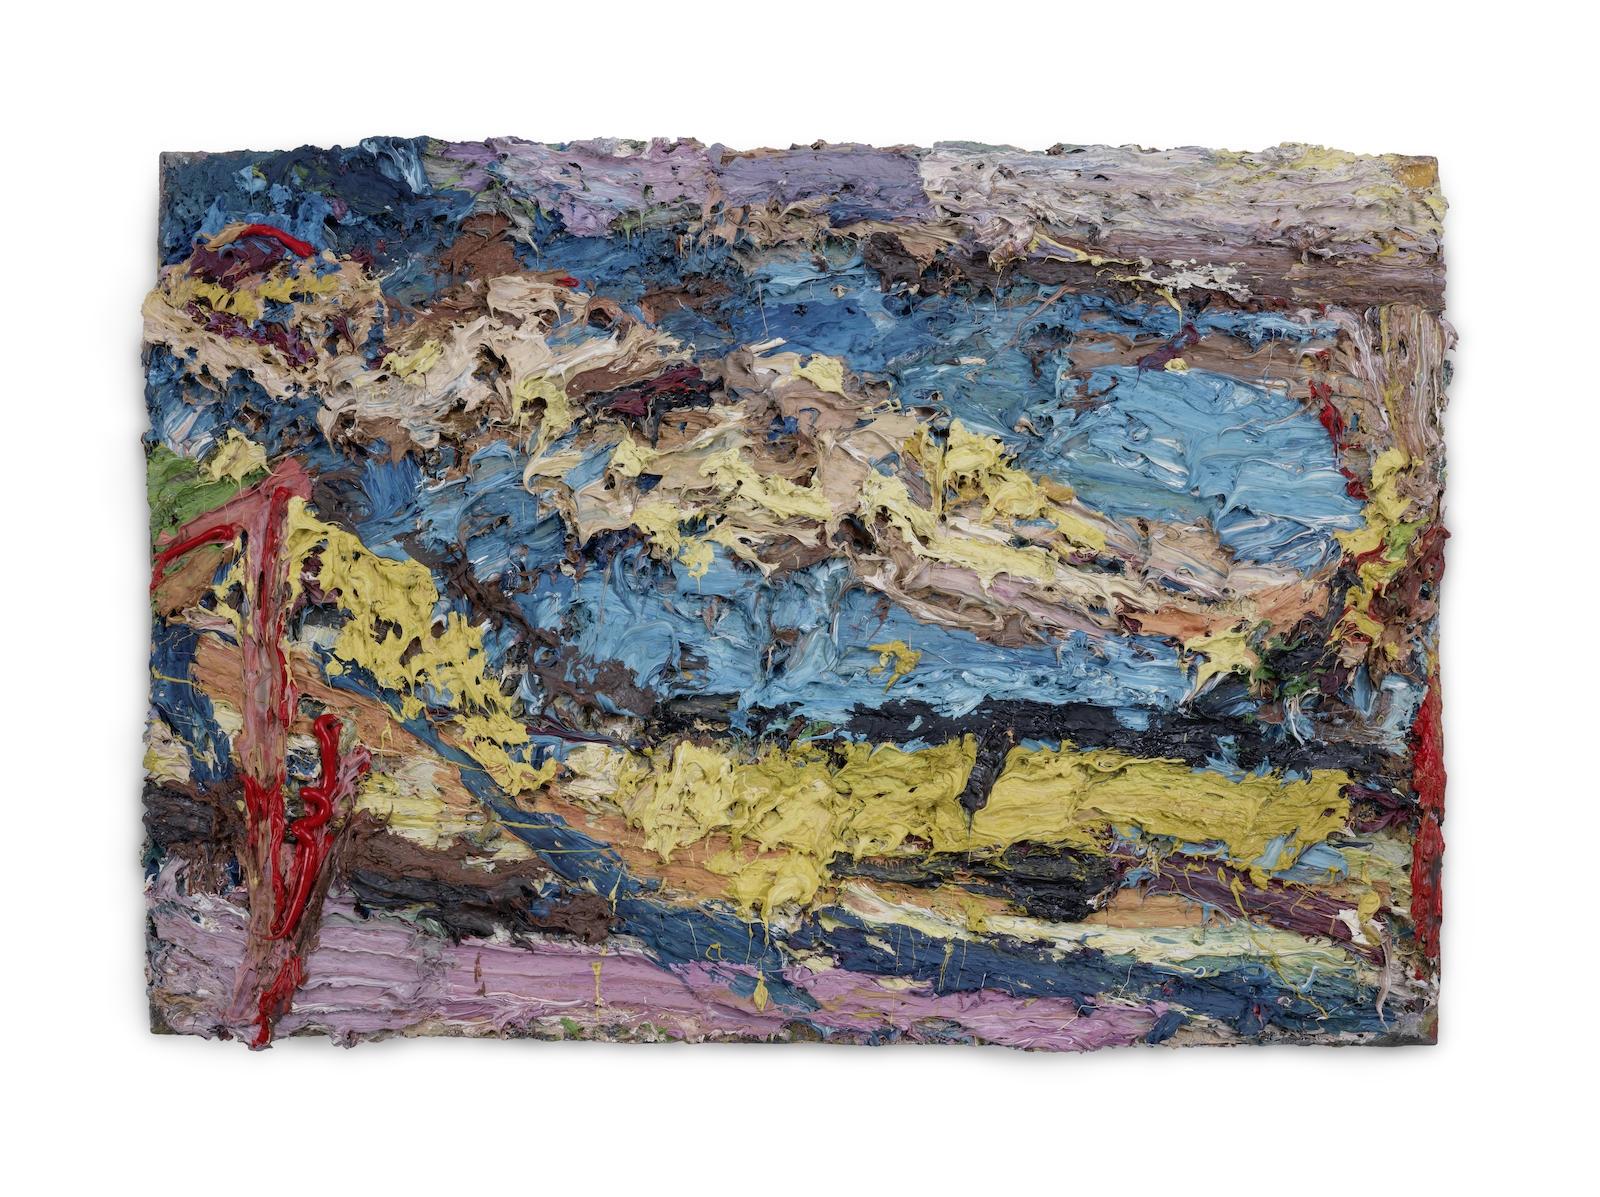 Frank Auerbach, EOW on her Blue Eiderdown IV (500-700k) 1